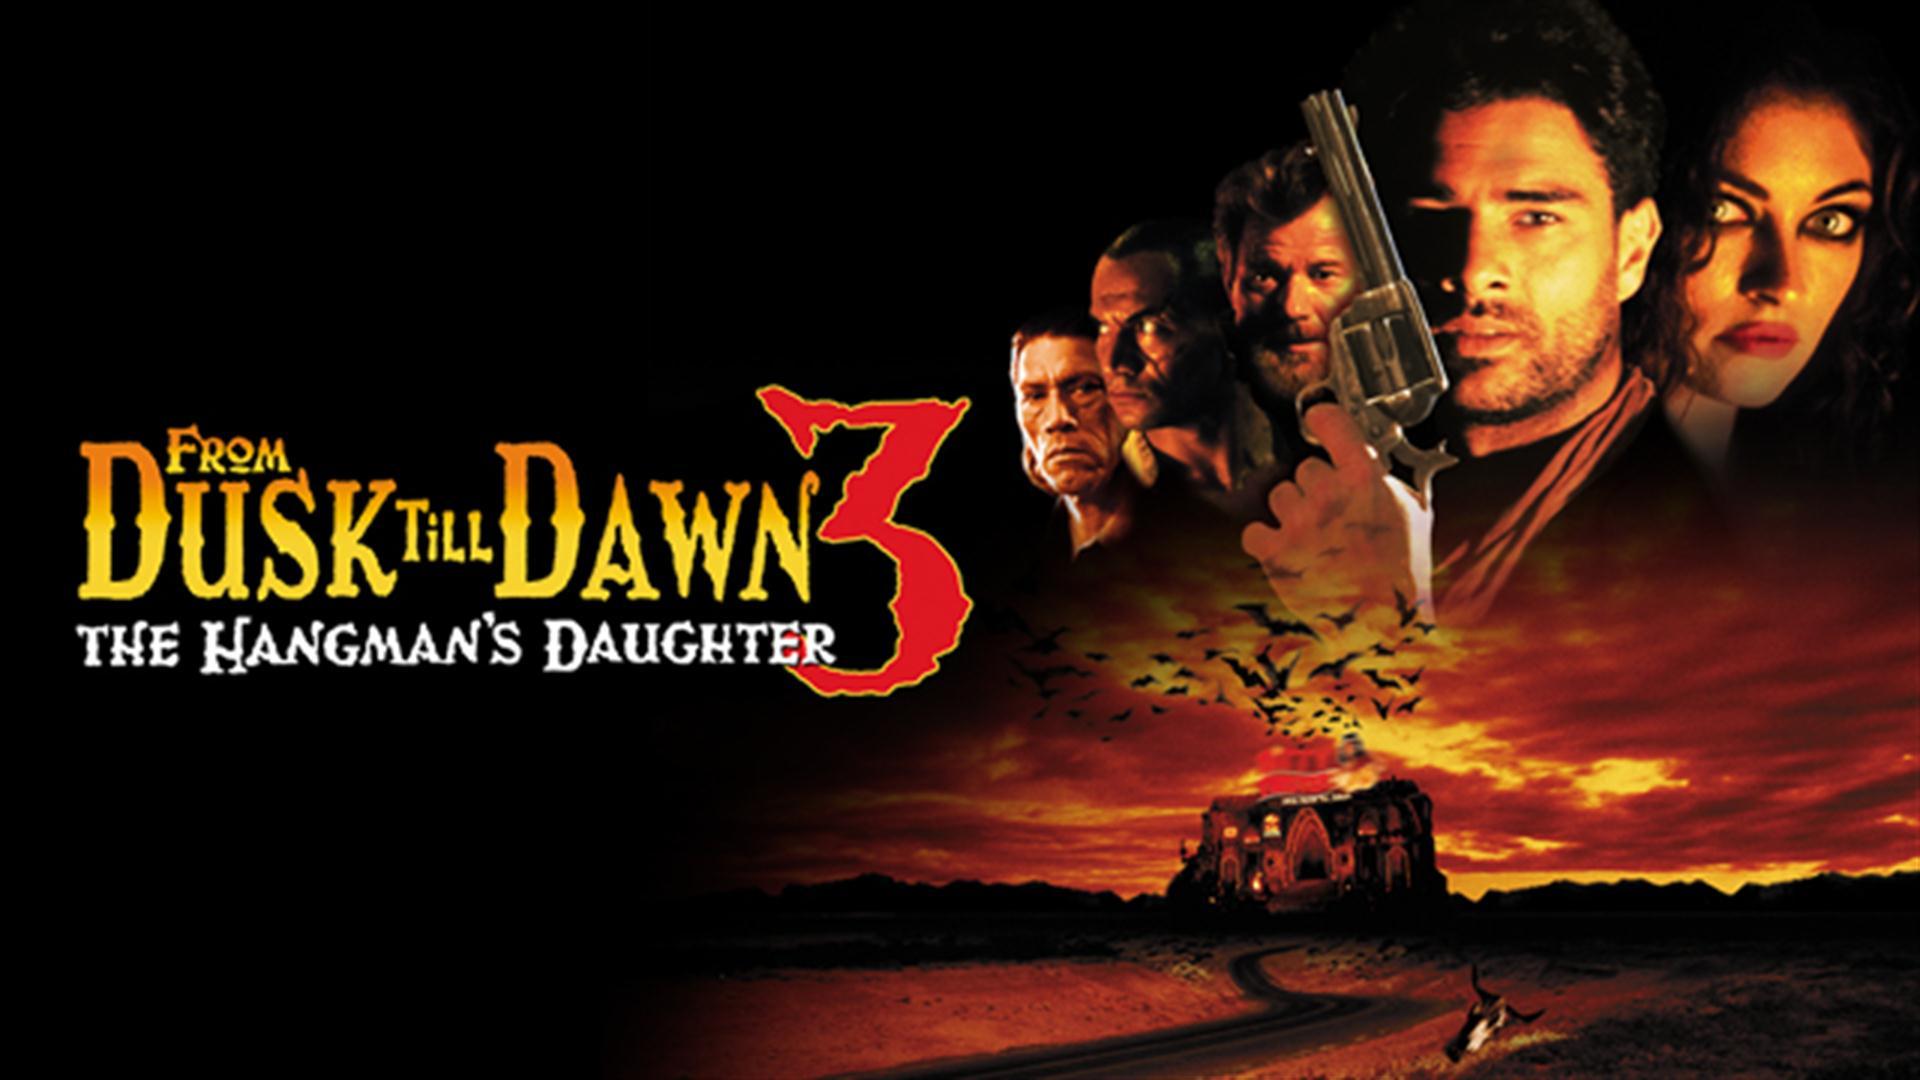 From Dusk Till Dawn 3: The Hangman's Daughter - Official Trailer (HD)